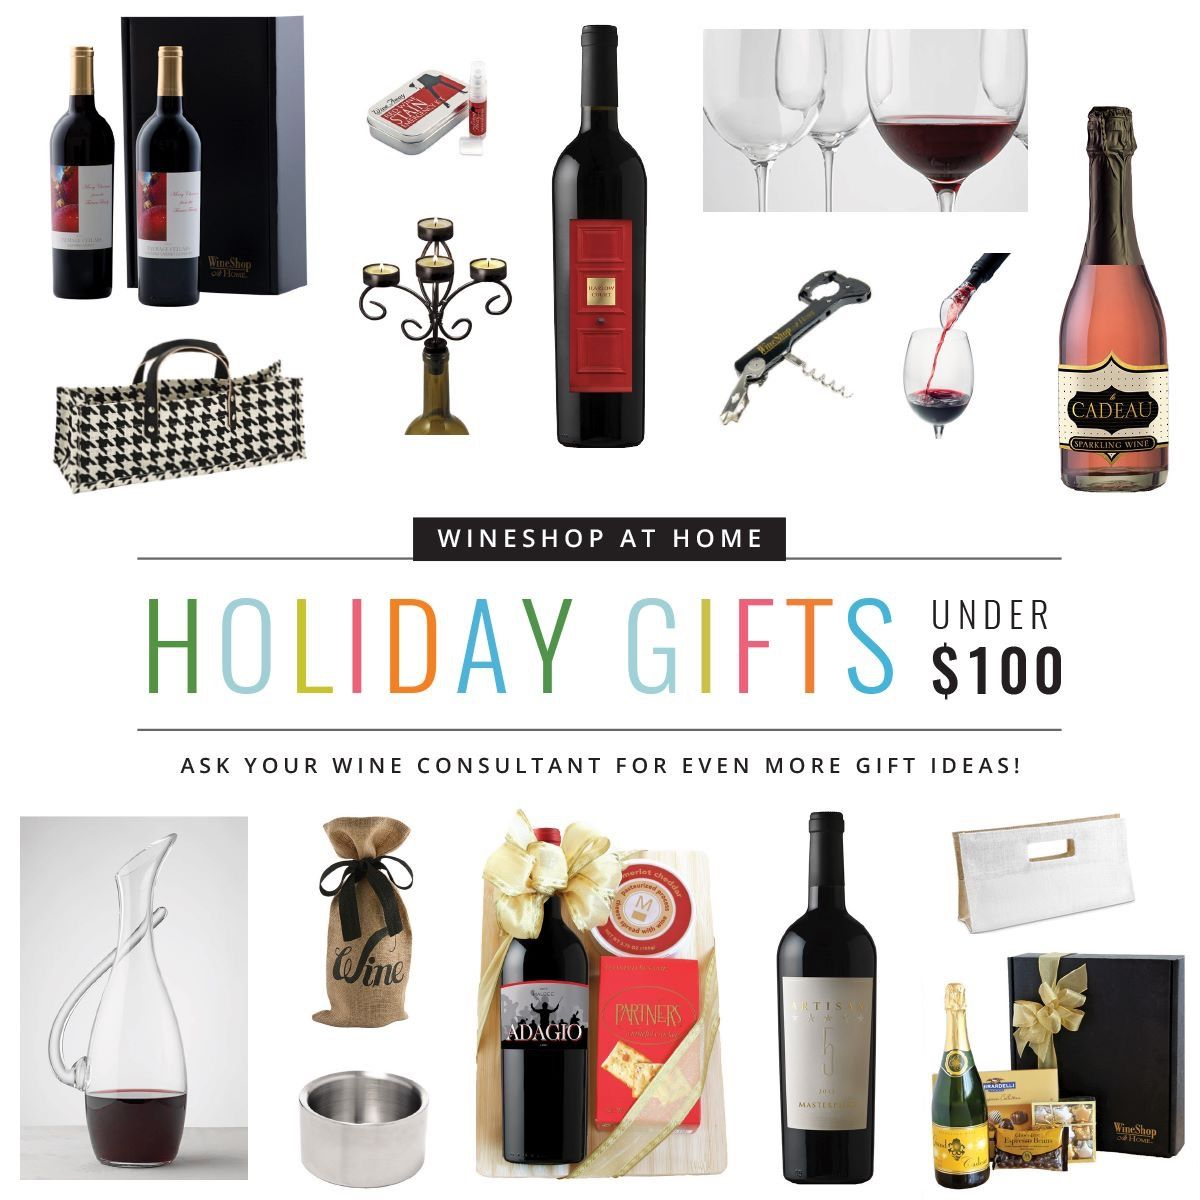 Pin by Shaz Wine Cellar on Holidays | Pinterest | Stocking stuffers ...